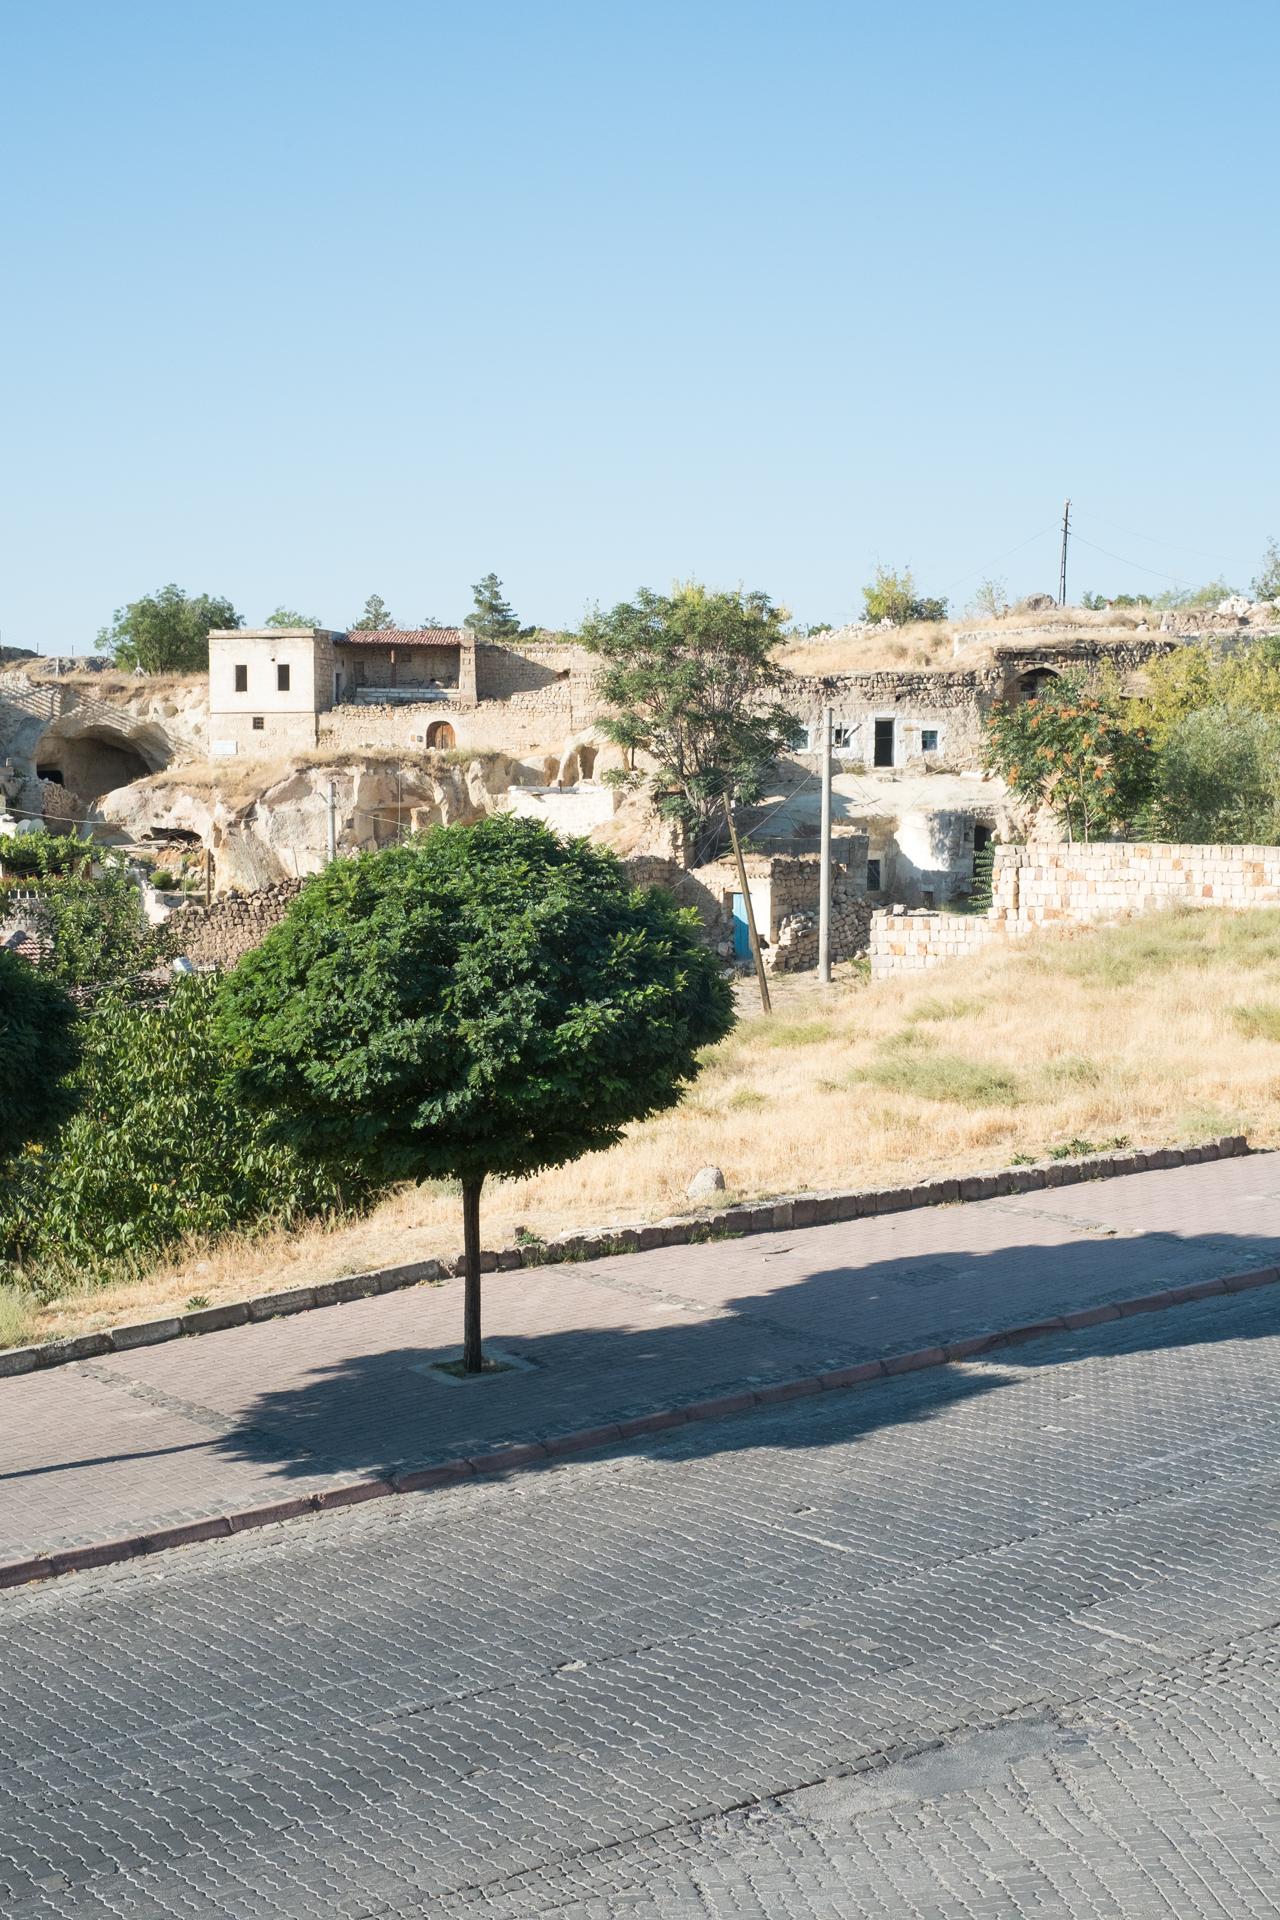 Imaginary Day : Cappadocia 056   pigment print, framed  60 x 40cm, 2013